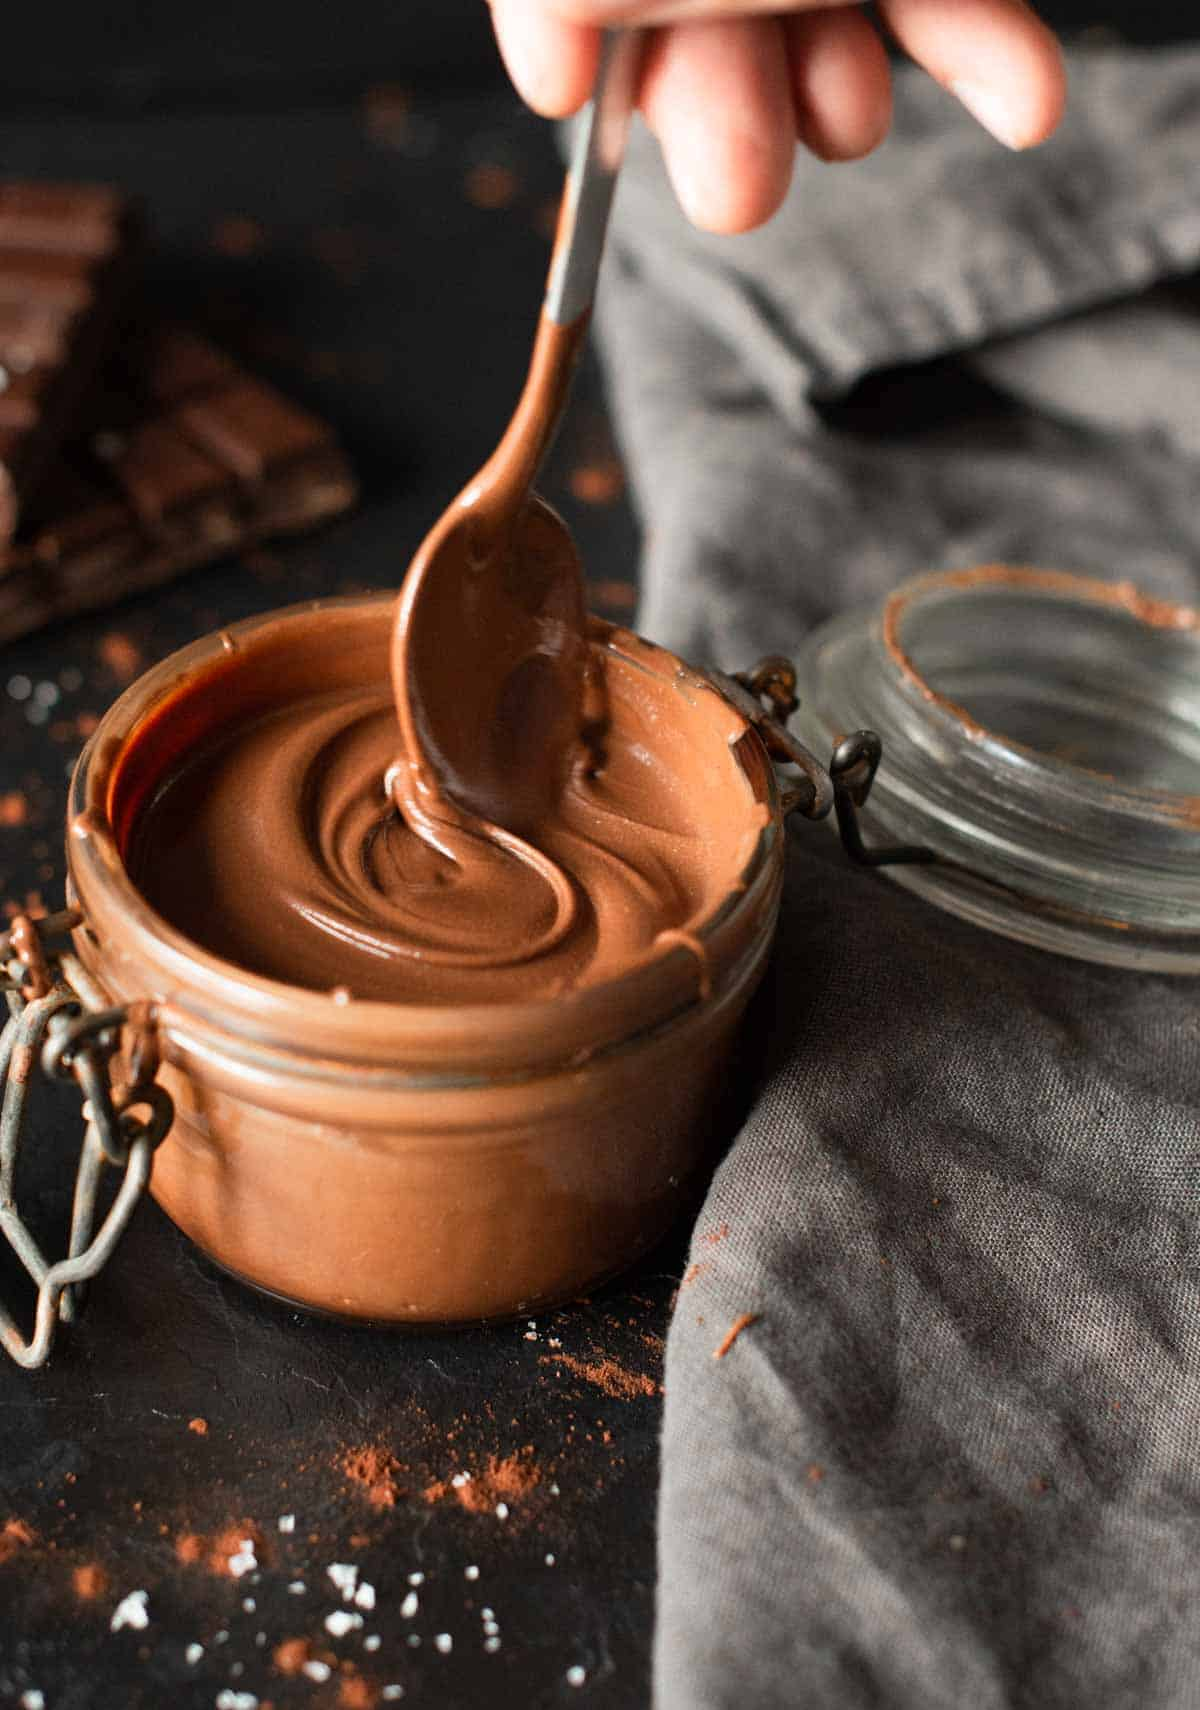 Image of homemade nutella